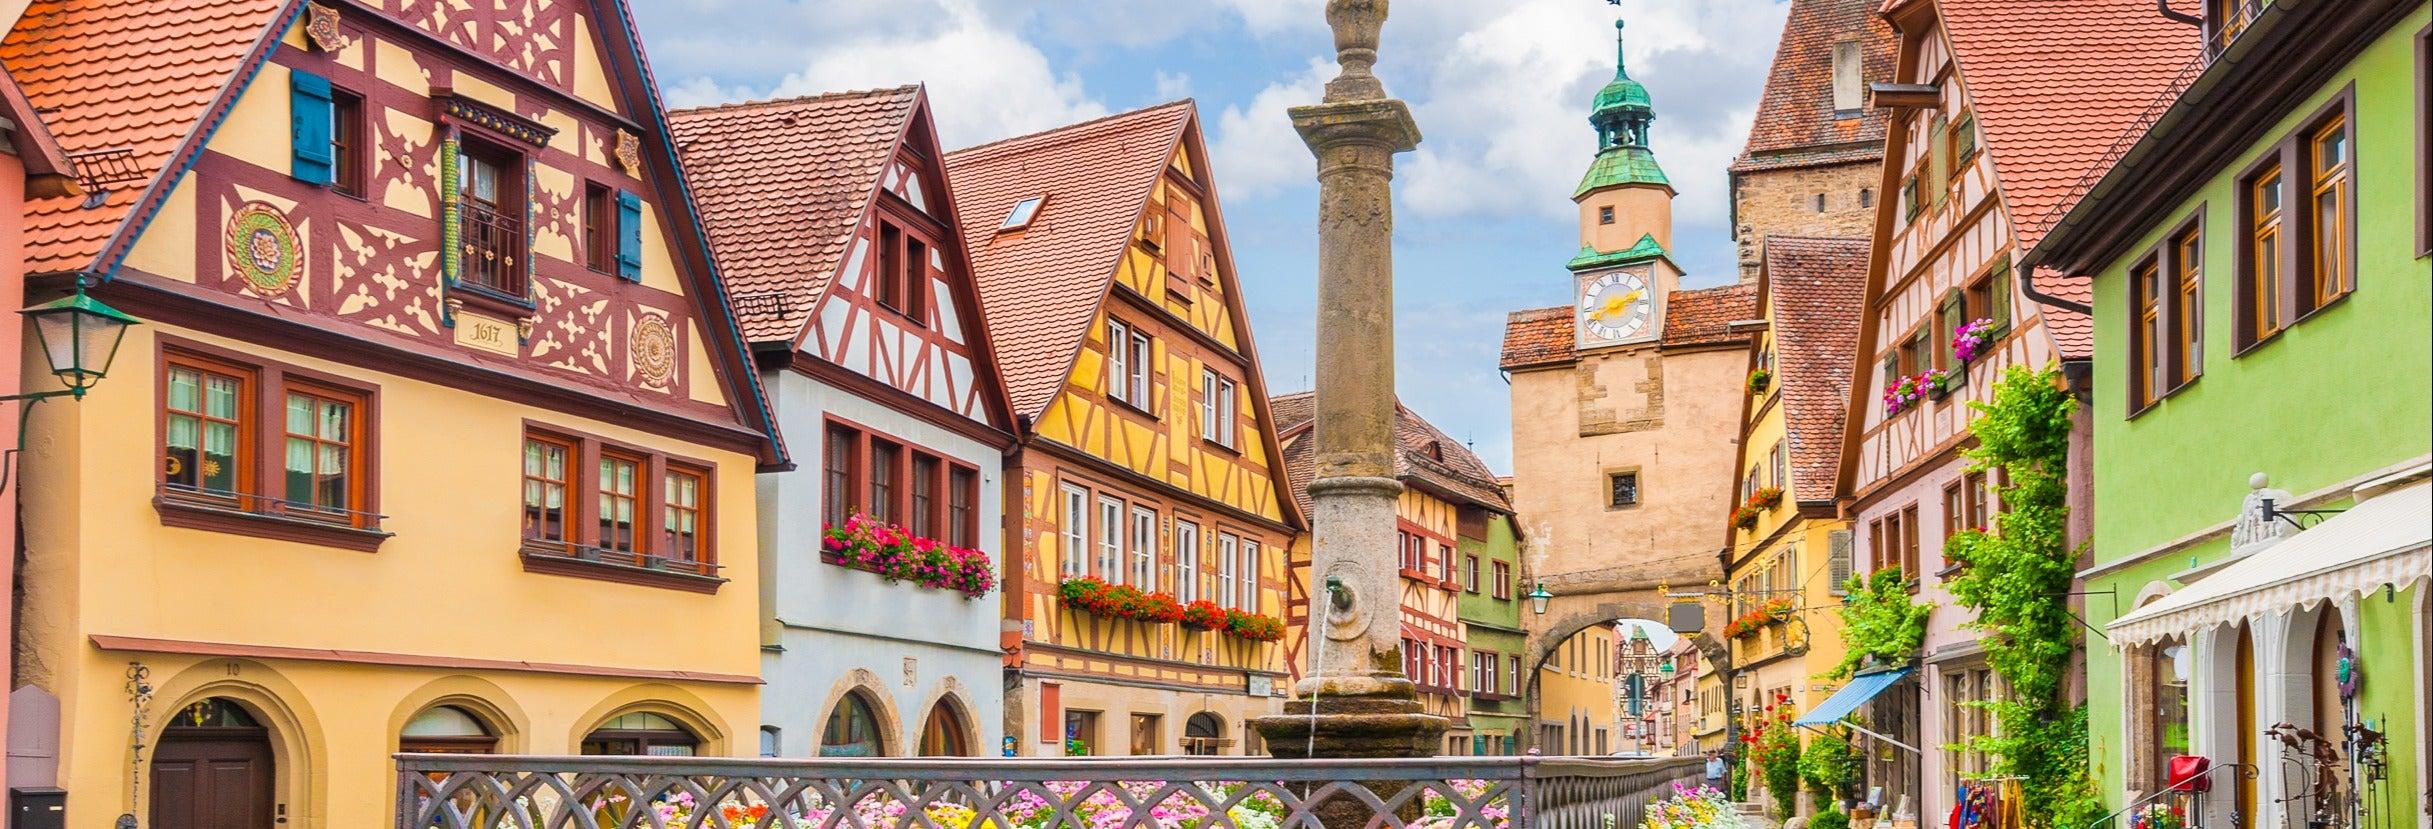 Private Tour of Rothenburg